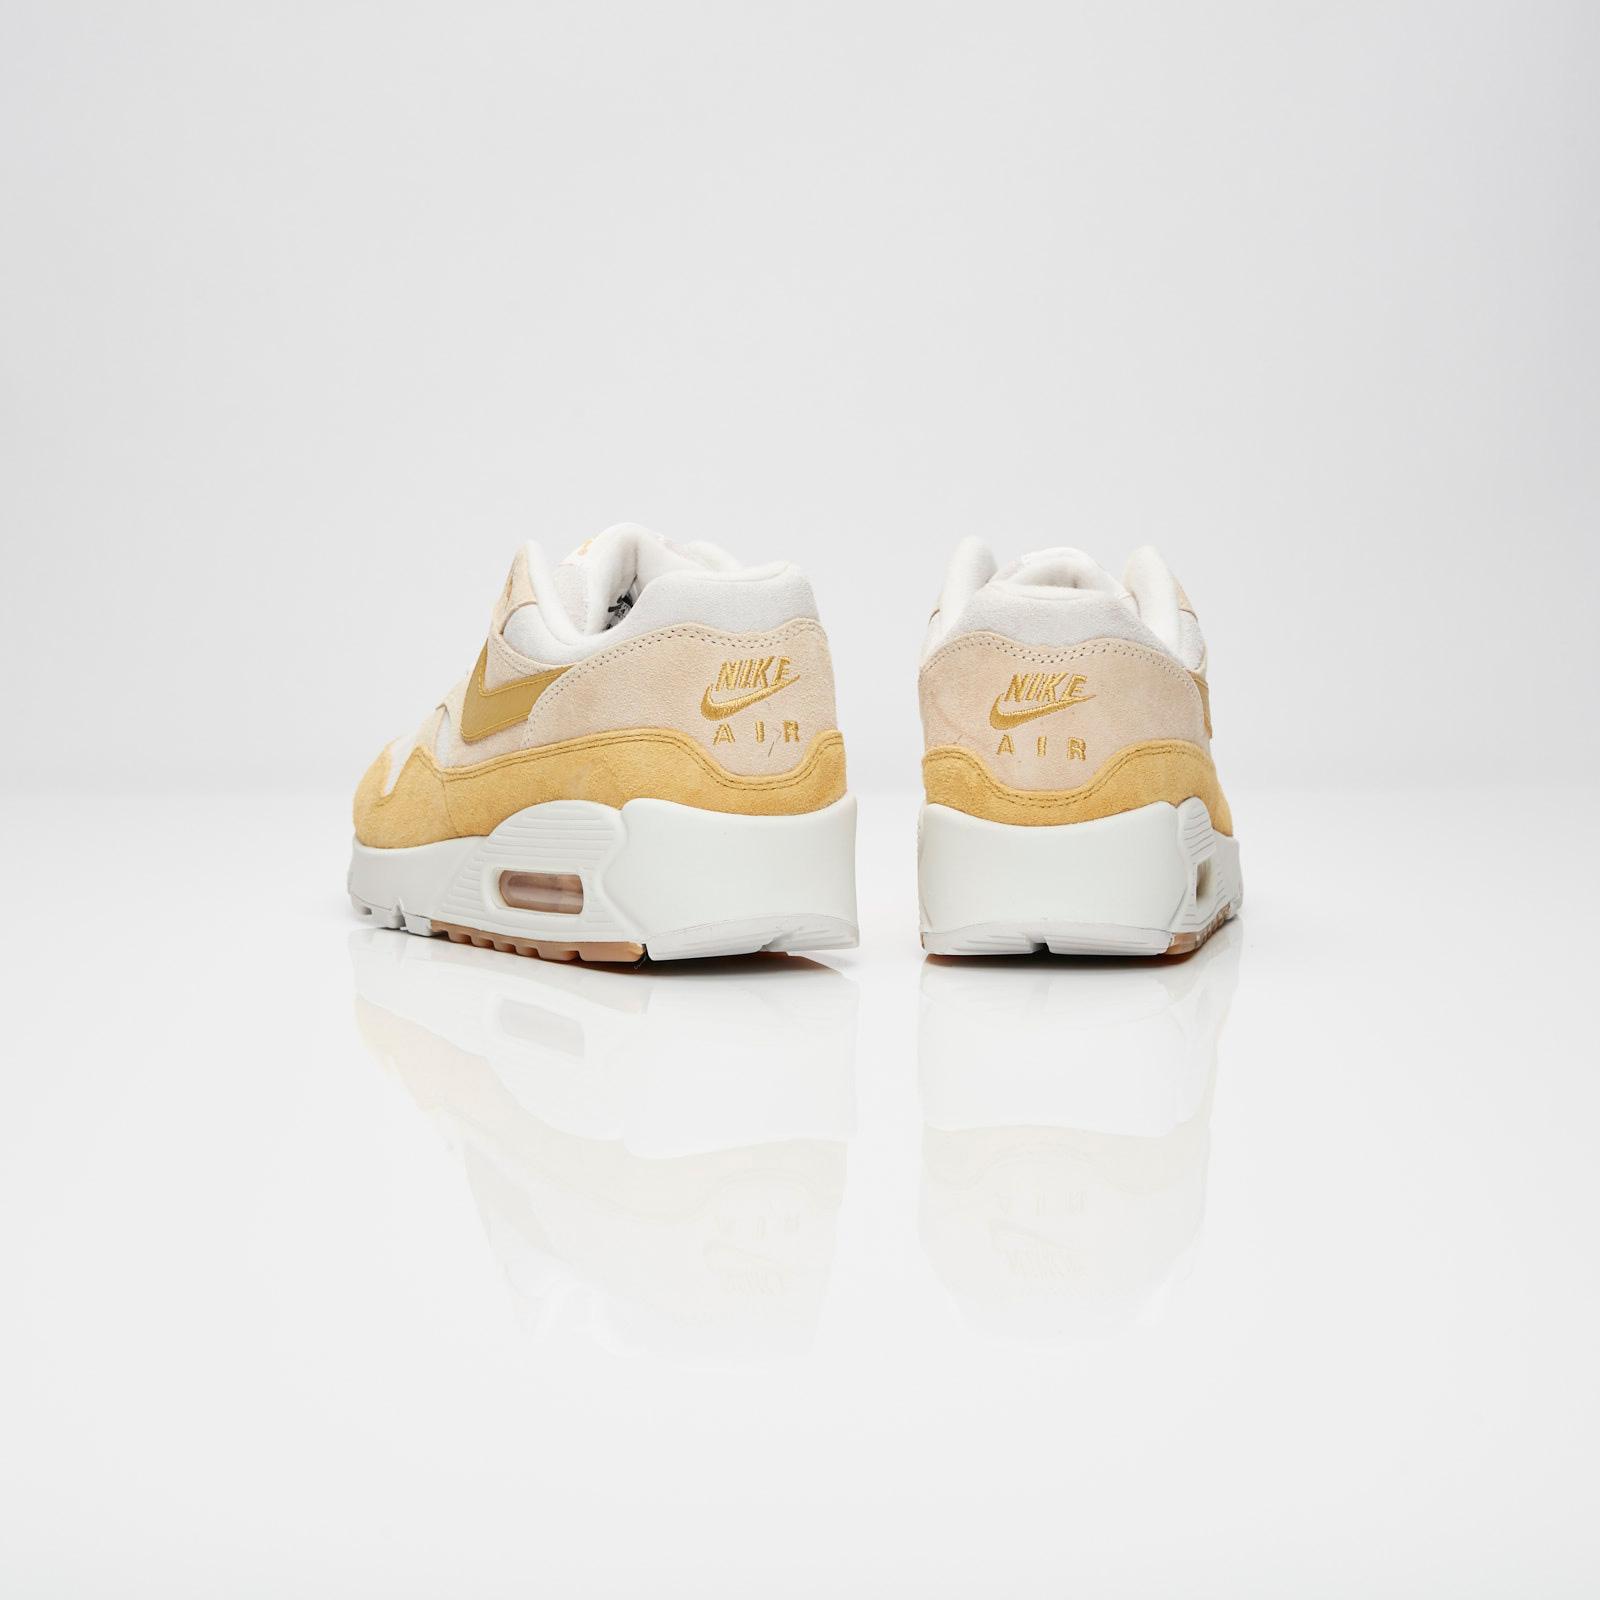 d14ac8cece Nike Wmns Air Max 90/1 - Aq1273-800 - Sneakersnstuff   sneakers &  streetwear online since 1999